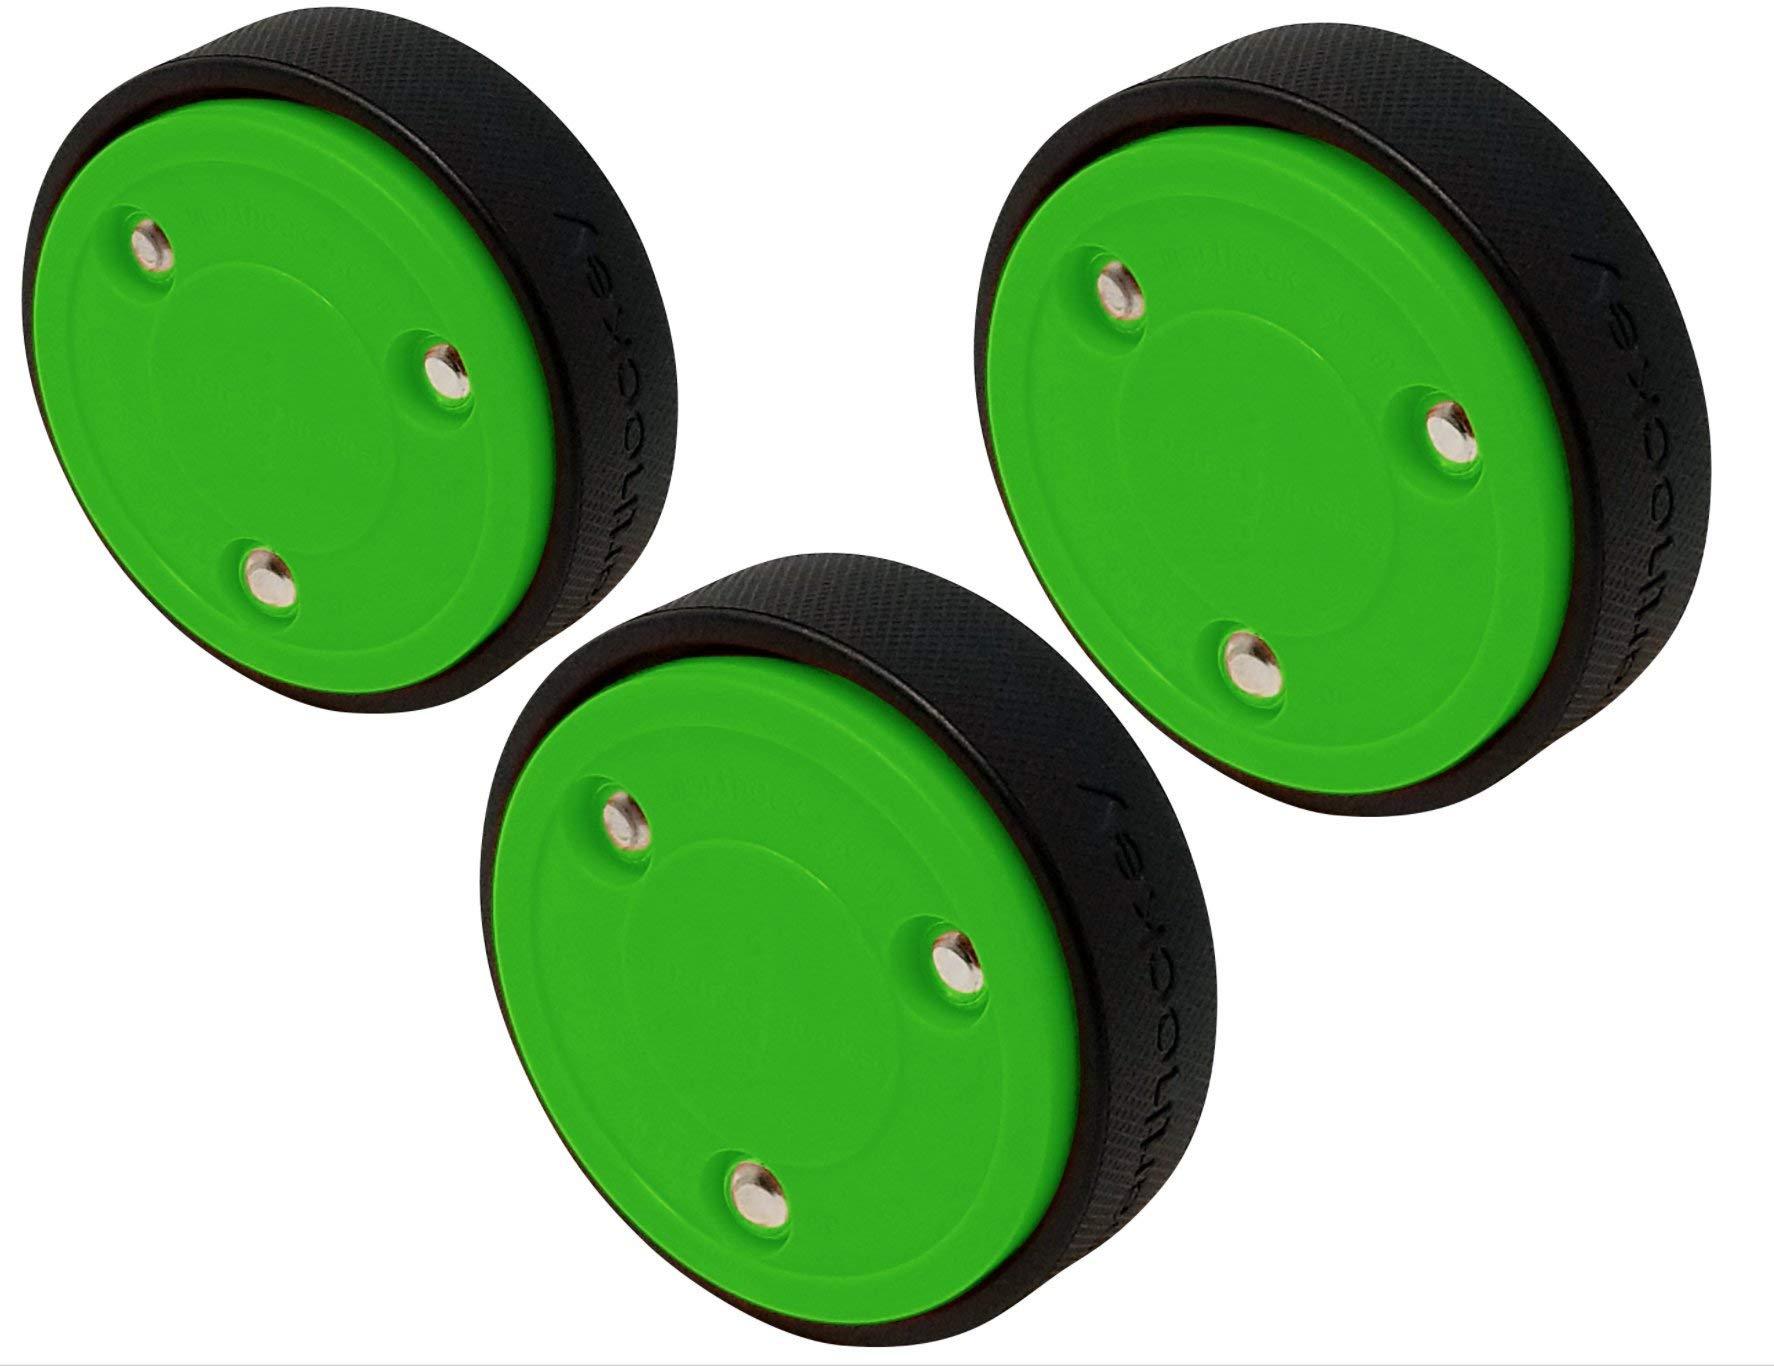 Smarthockey 4oz Slider Hockey Training Speed Puck - Green 3-Pack